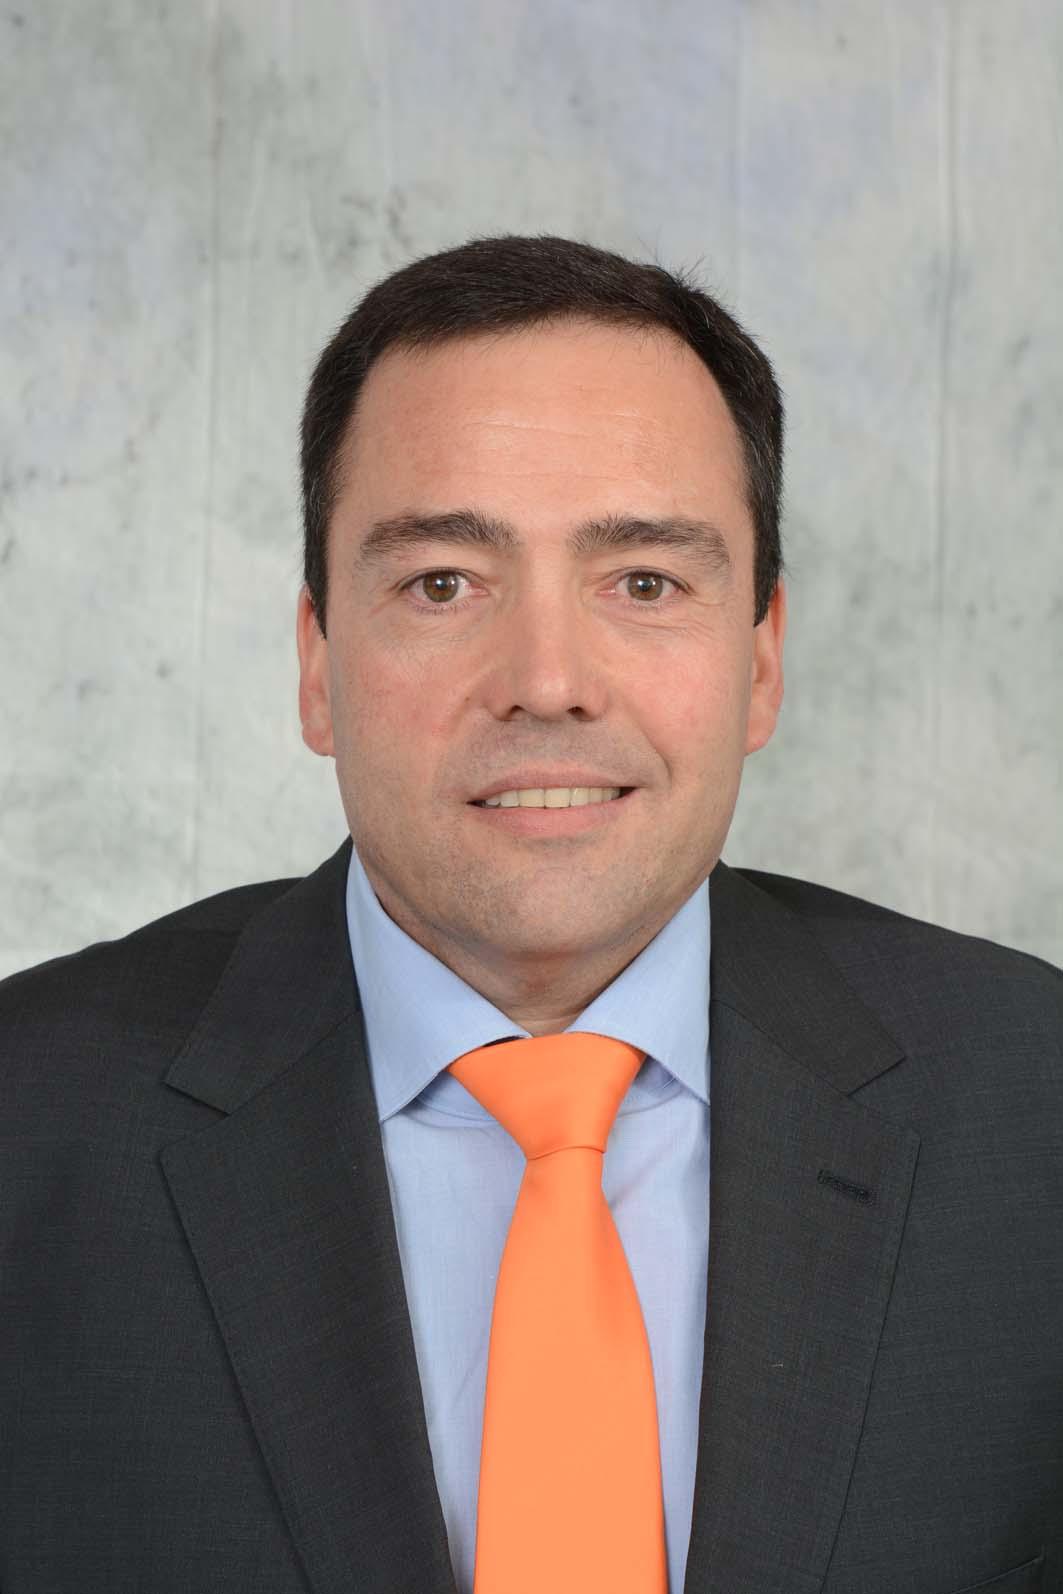 Mr. C. Cabanelas